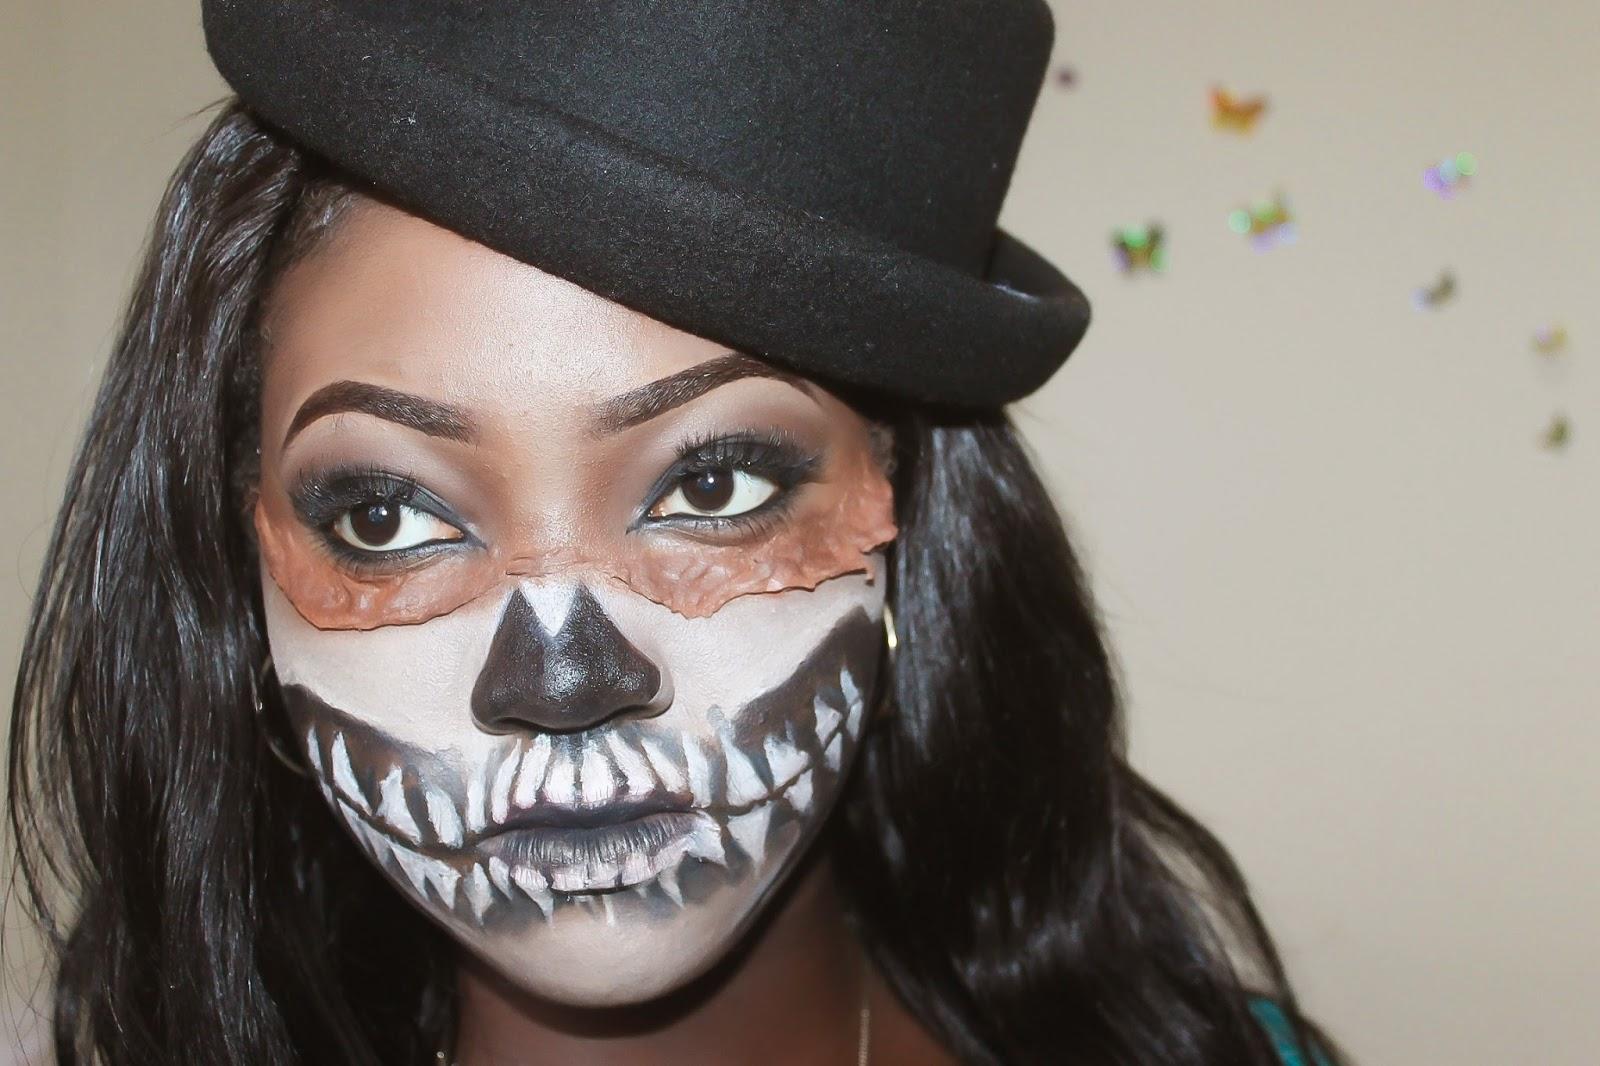 UWANI ALIYU: FX MAKEUP - in the spirit of halloween